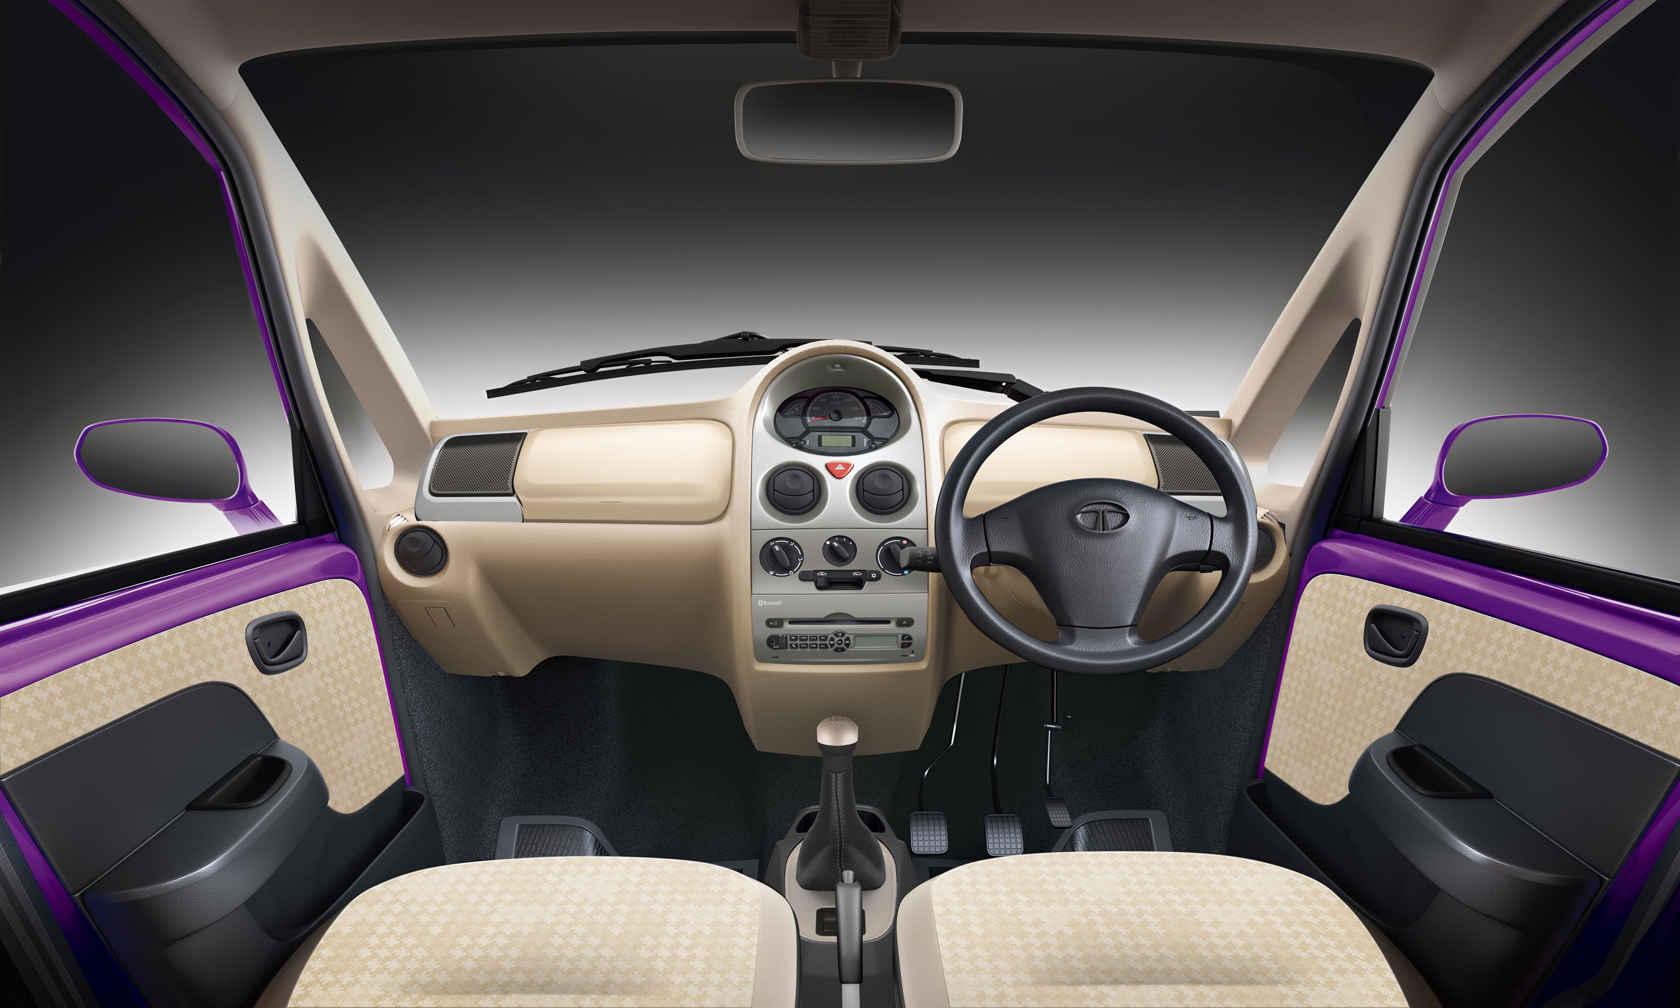 Design of tata nano car - Tata Nano Twist In Design